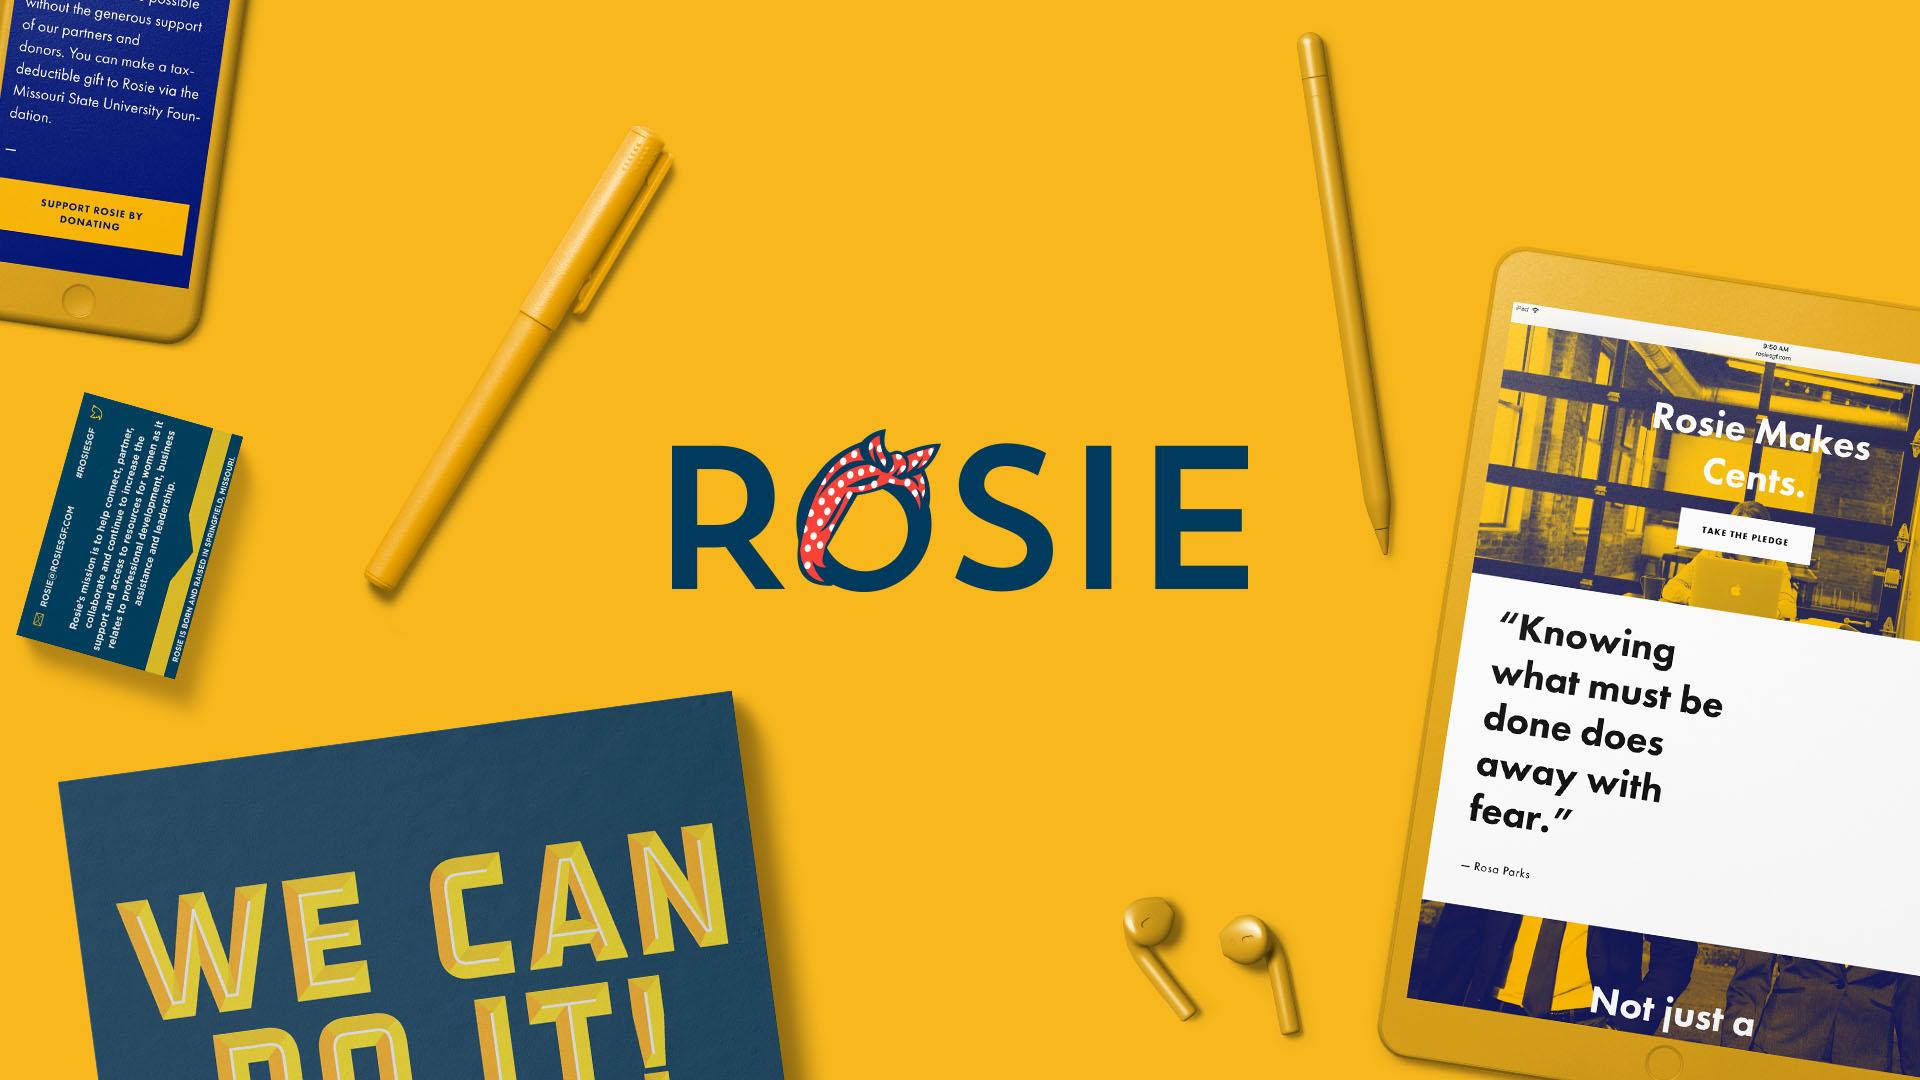 Brand Design & Strategy | Rosie Springfield, MO